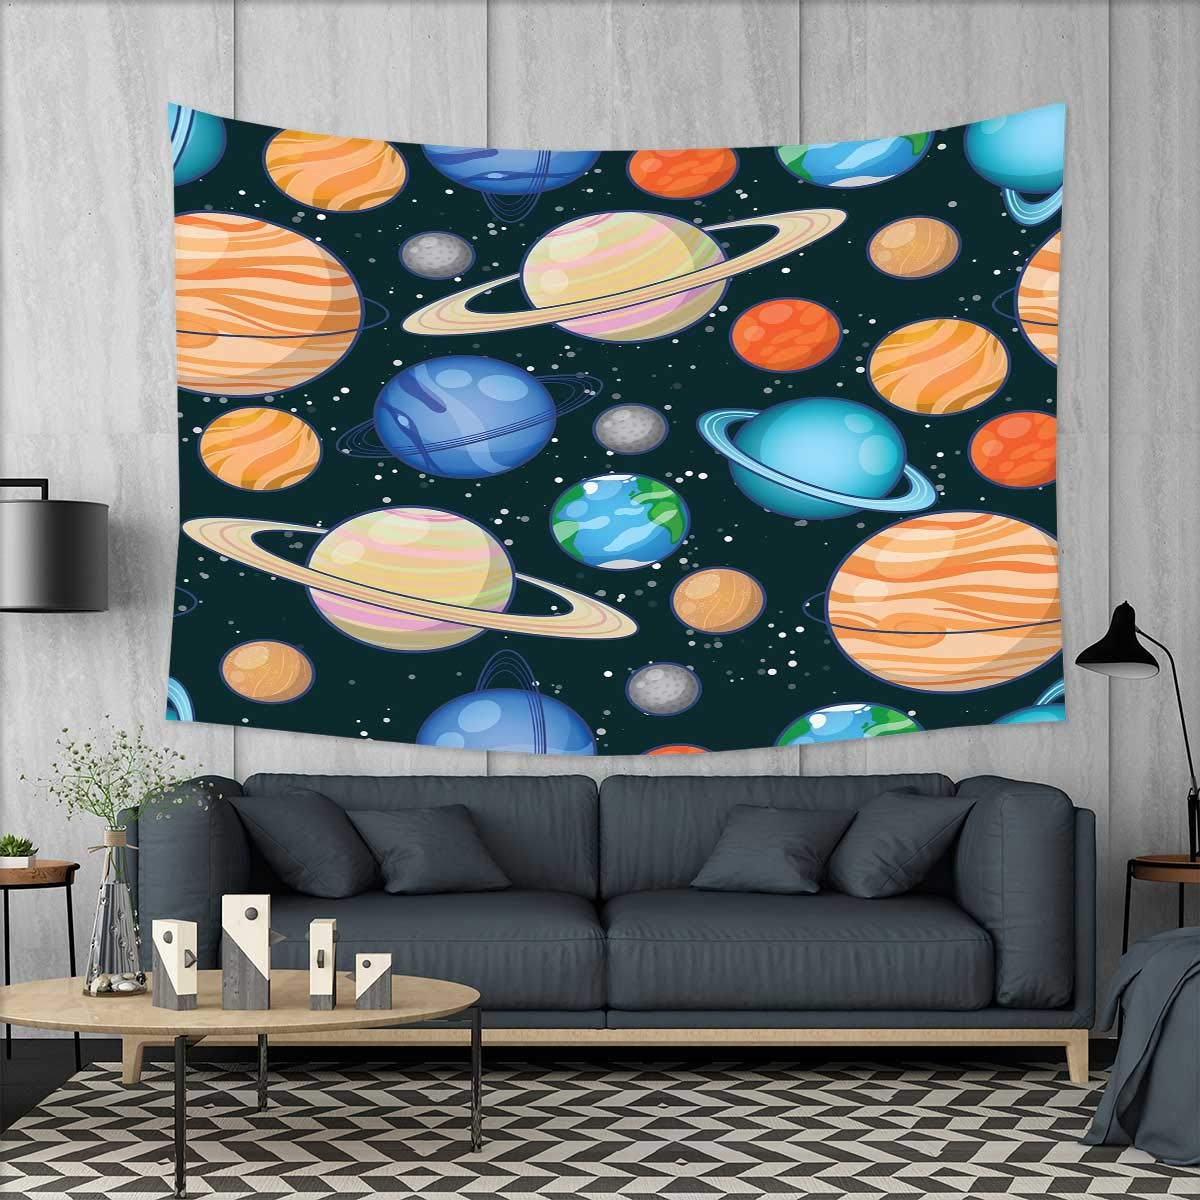 smallbeefly Galaxy Tapestry Table Cover Bedspread Beach Towel Cute Galaxy Space Art Solar System Planets Mars Mercury Uranus Jupiter Venus Kids Print Dorm Decor 71''x60'' Multi